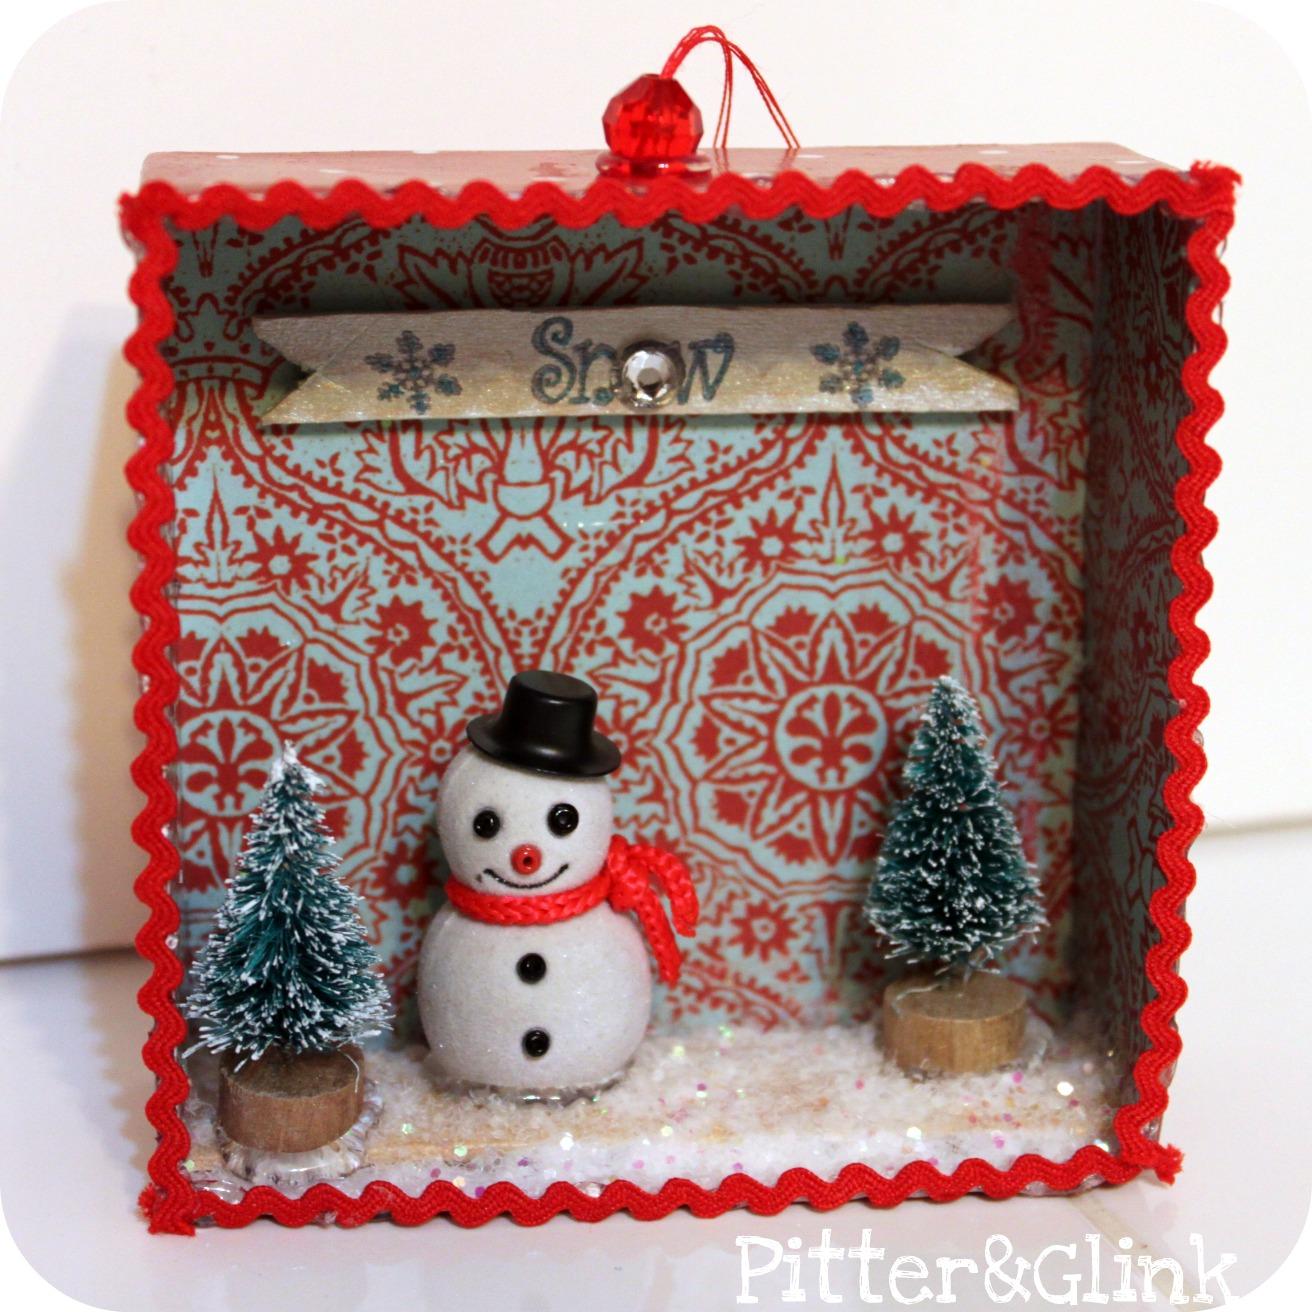 Pitterandglink gift box ornaments